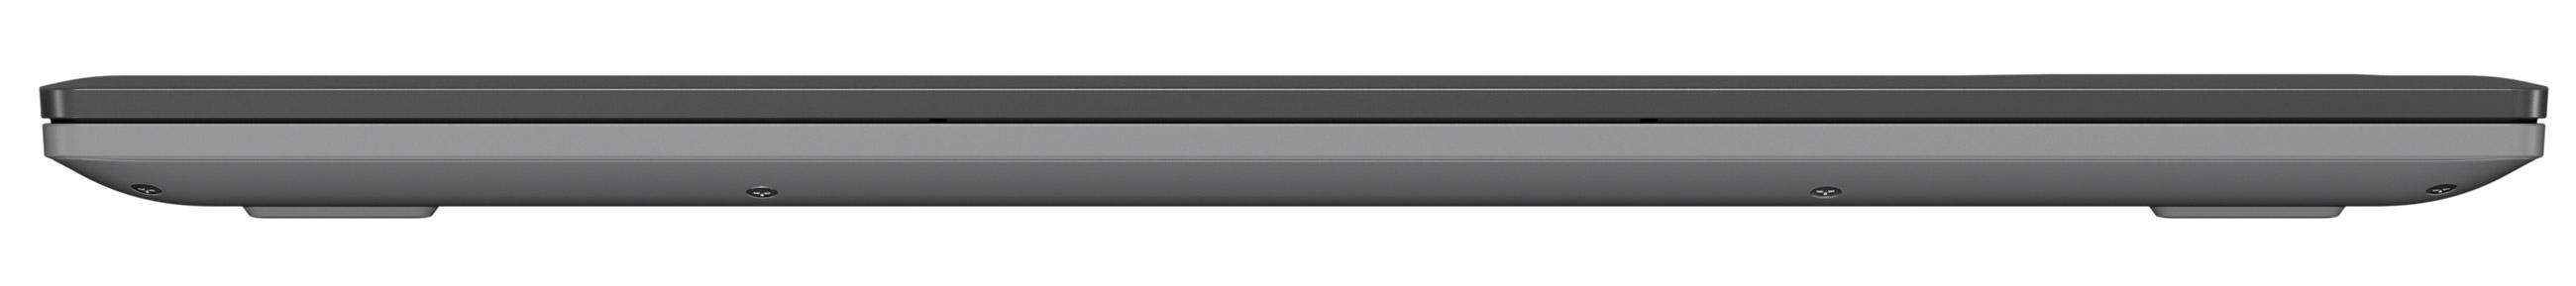 Фото  Ультрабук Lenovo Yoga 530 Onyx Black (81EK00KXRA)